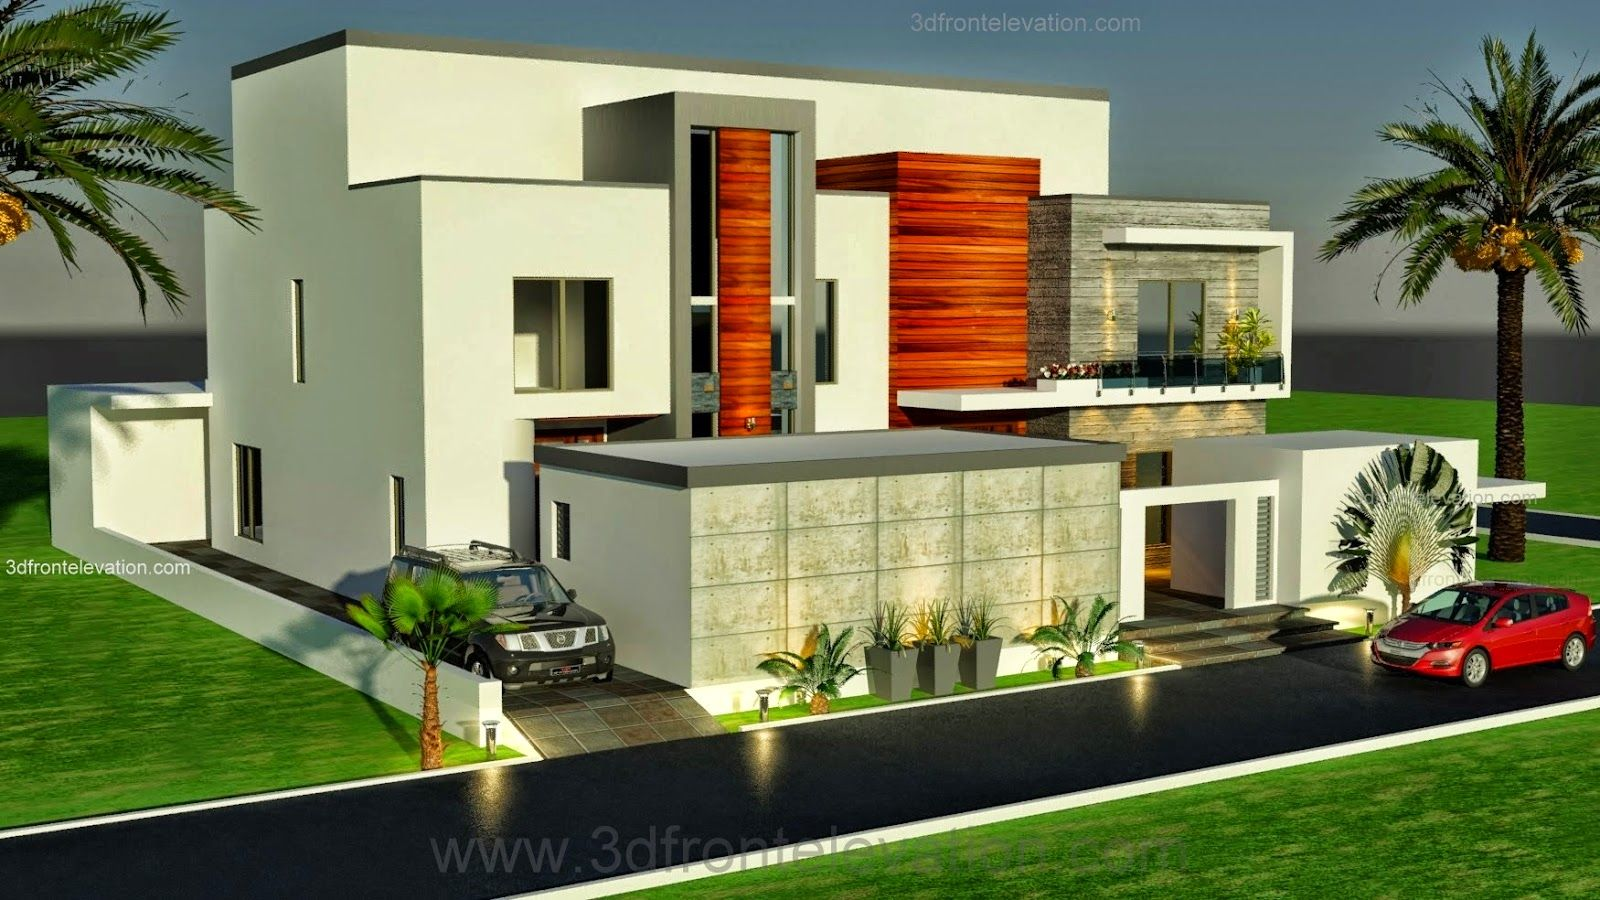 Dubai Arabian Modern Contemporary Beautiful House Design 3D Front